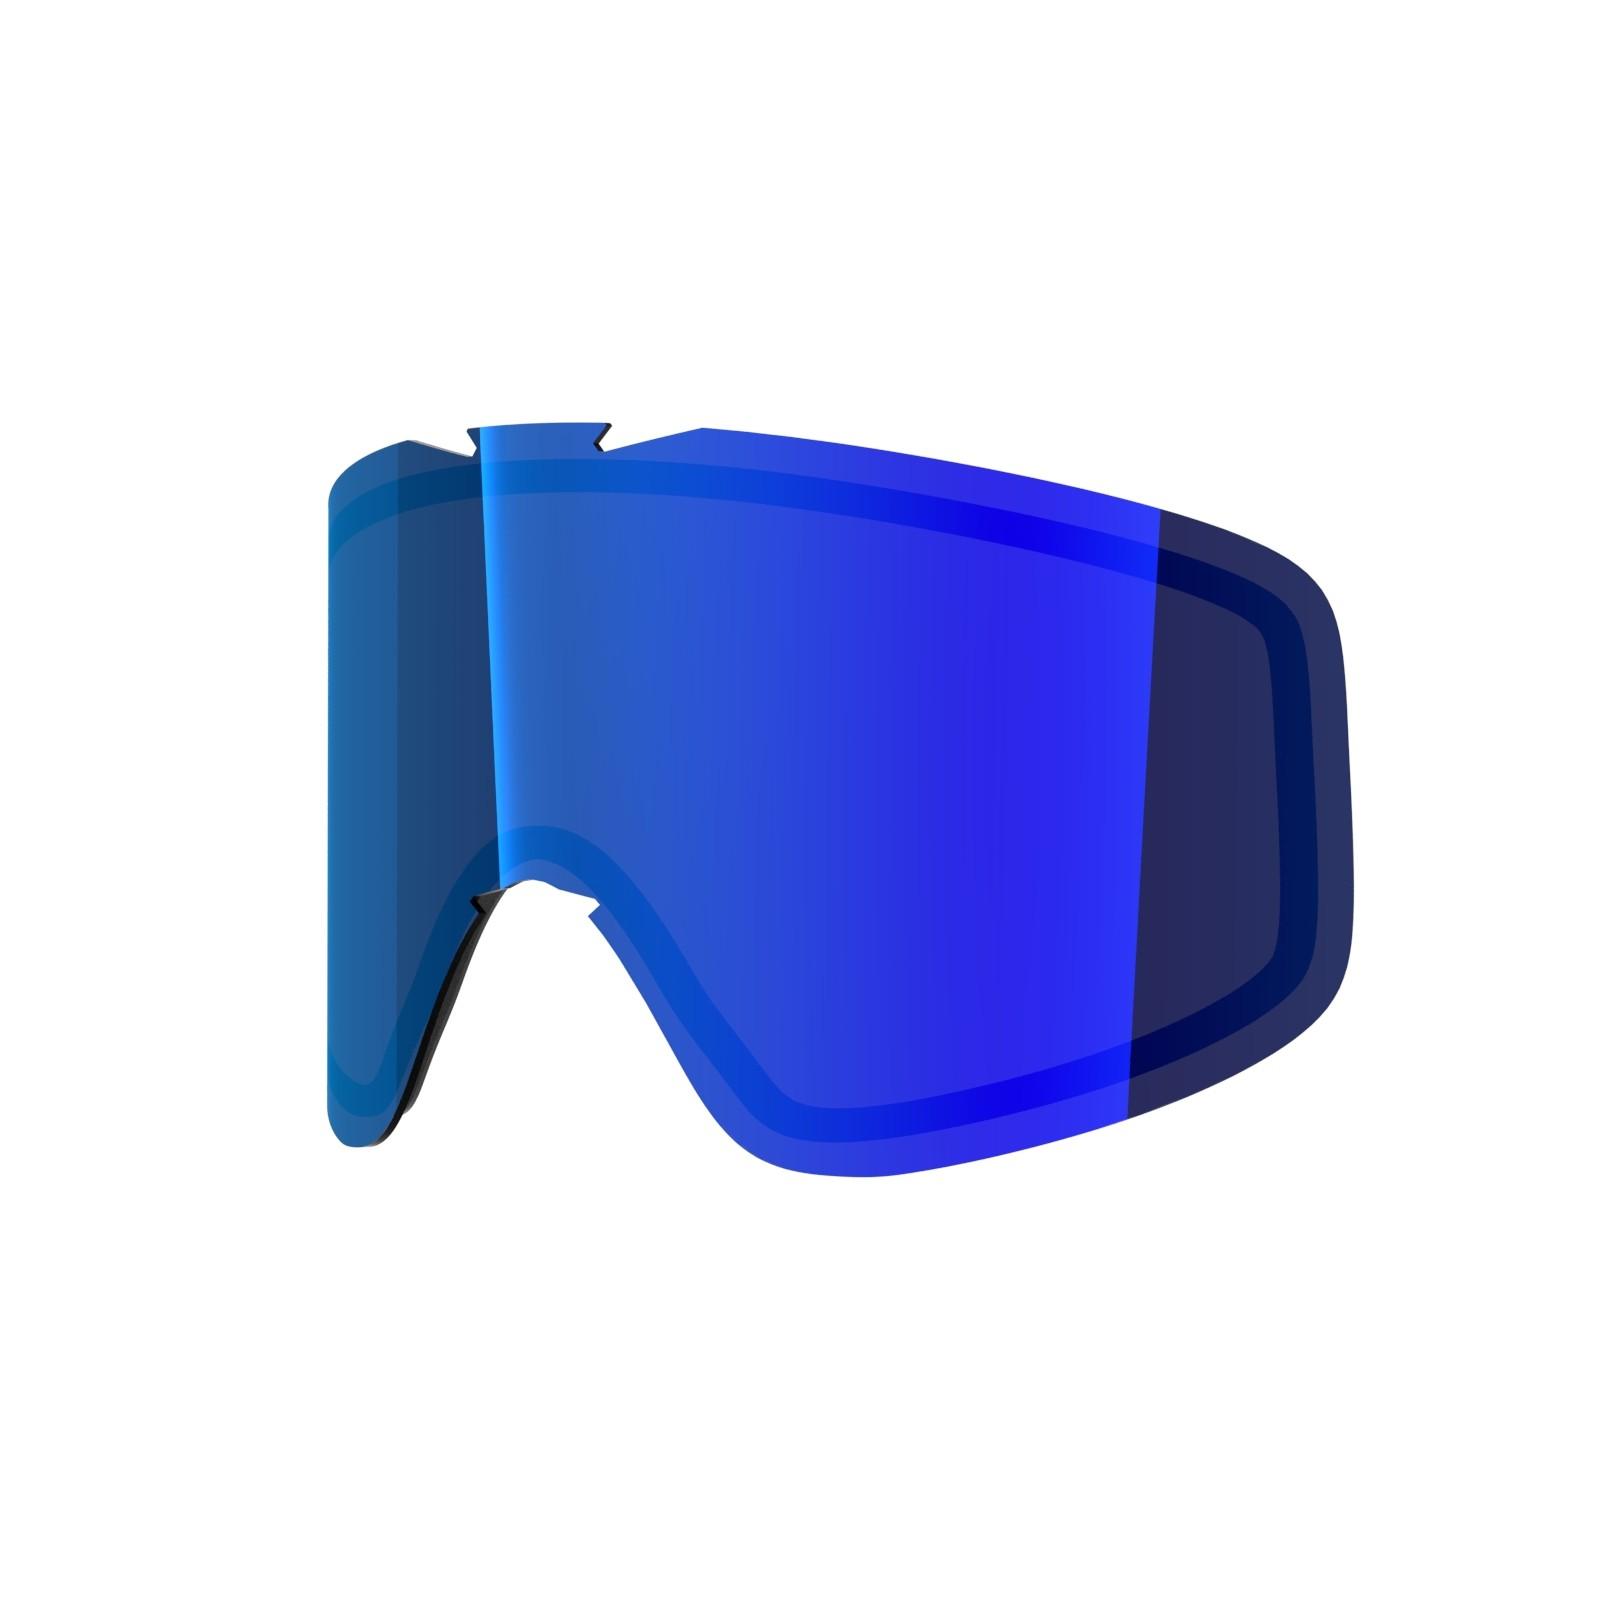 BLUE MCI lens for  Flat goggle